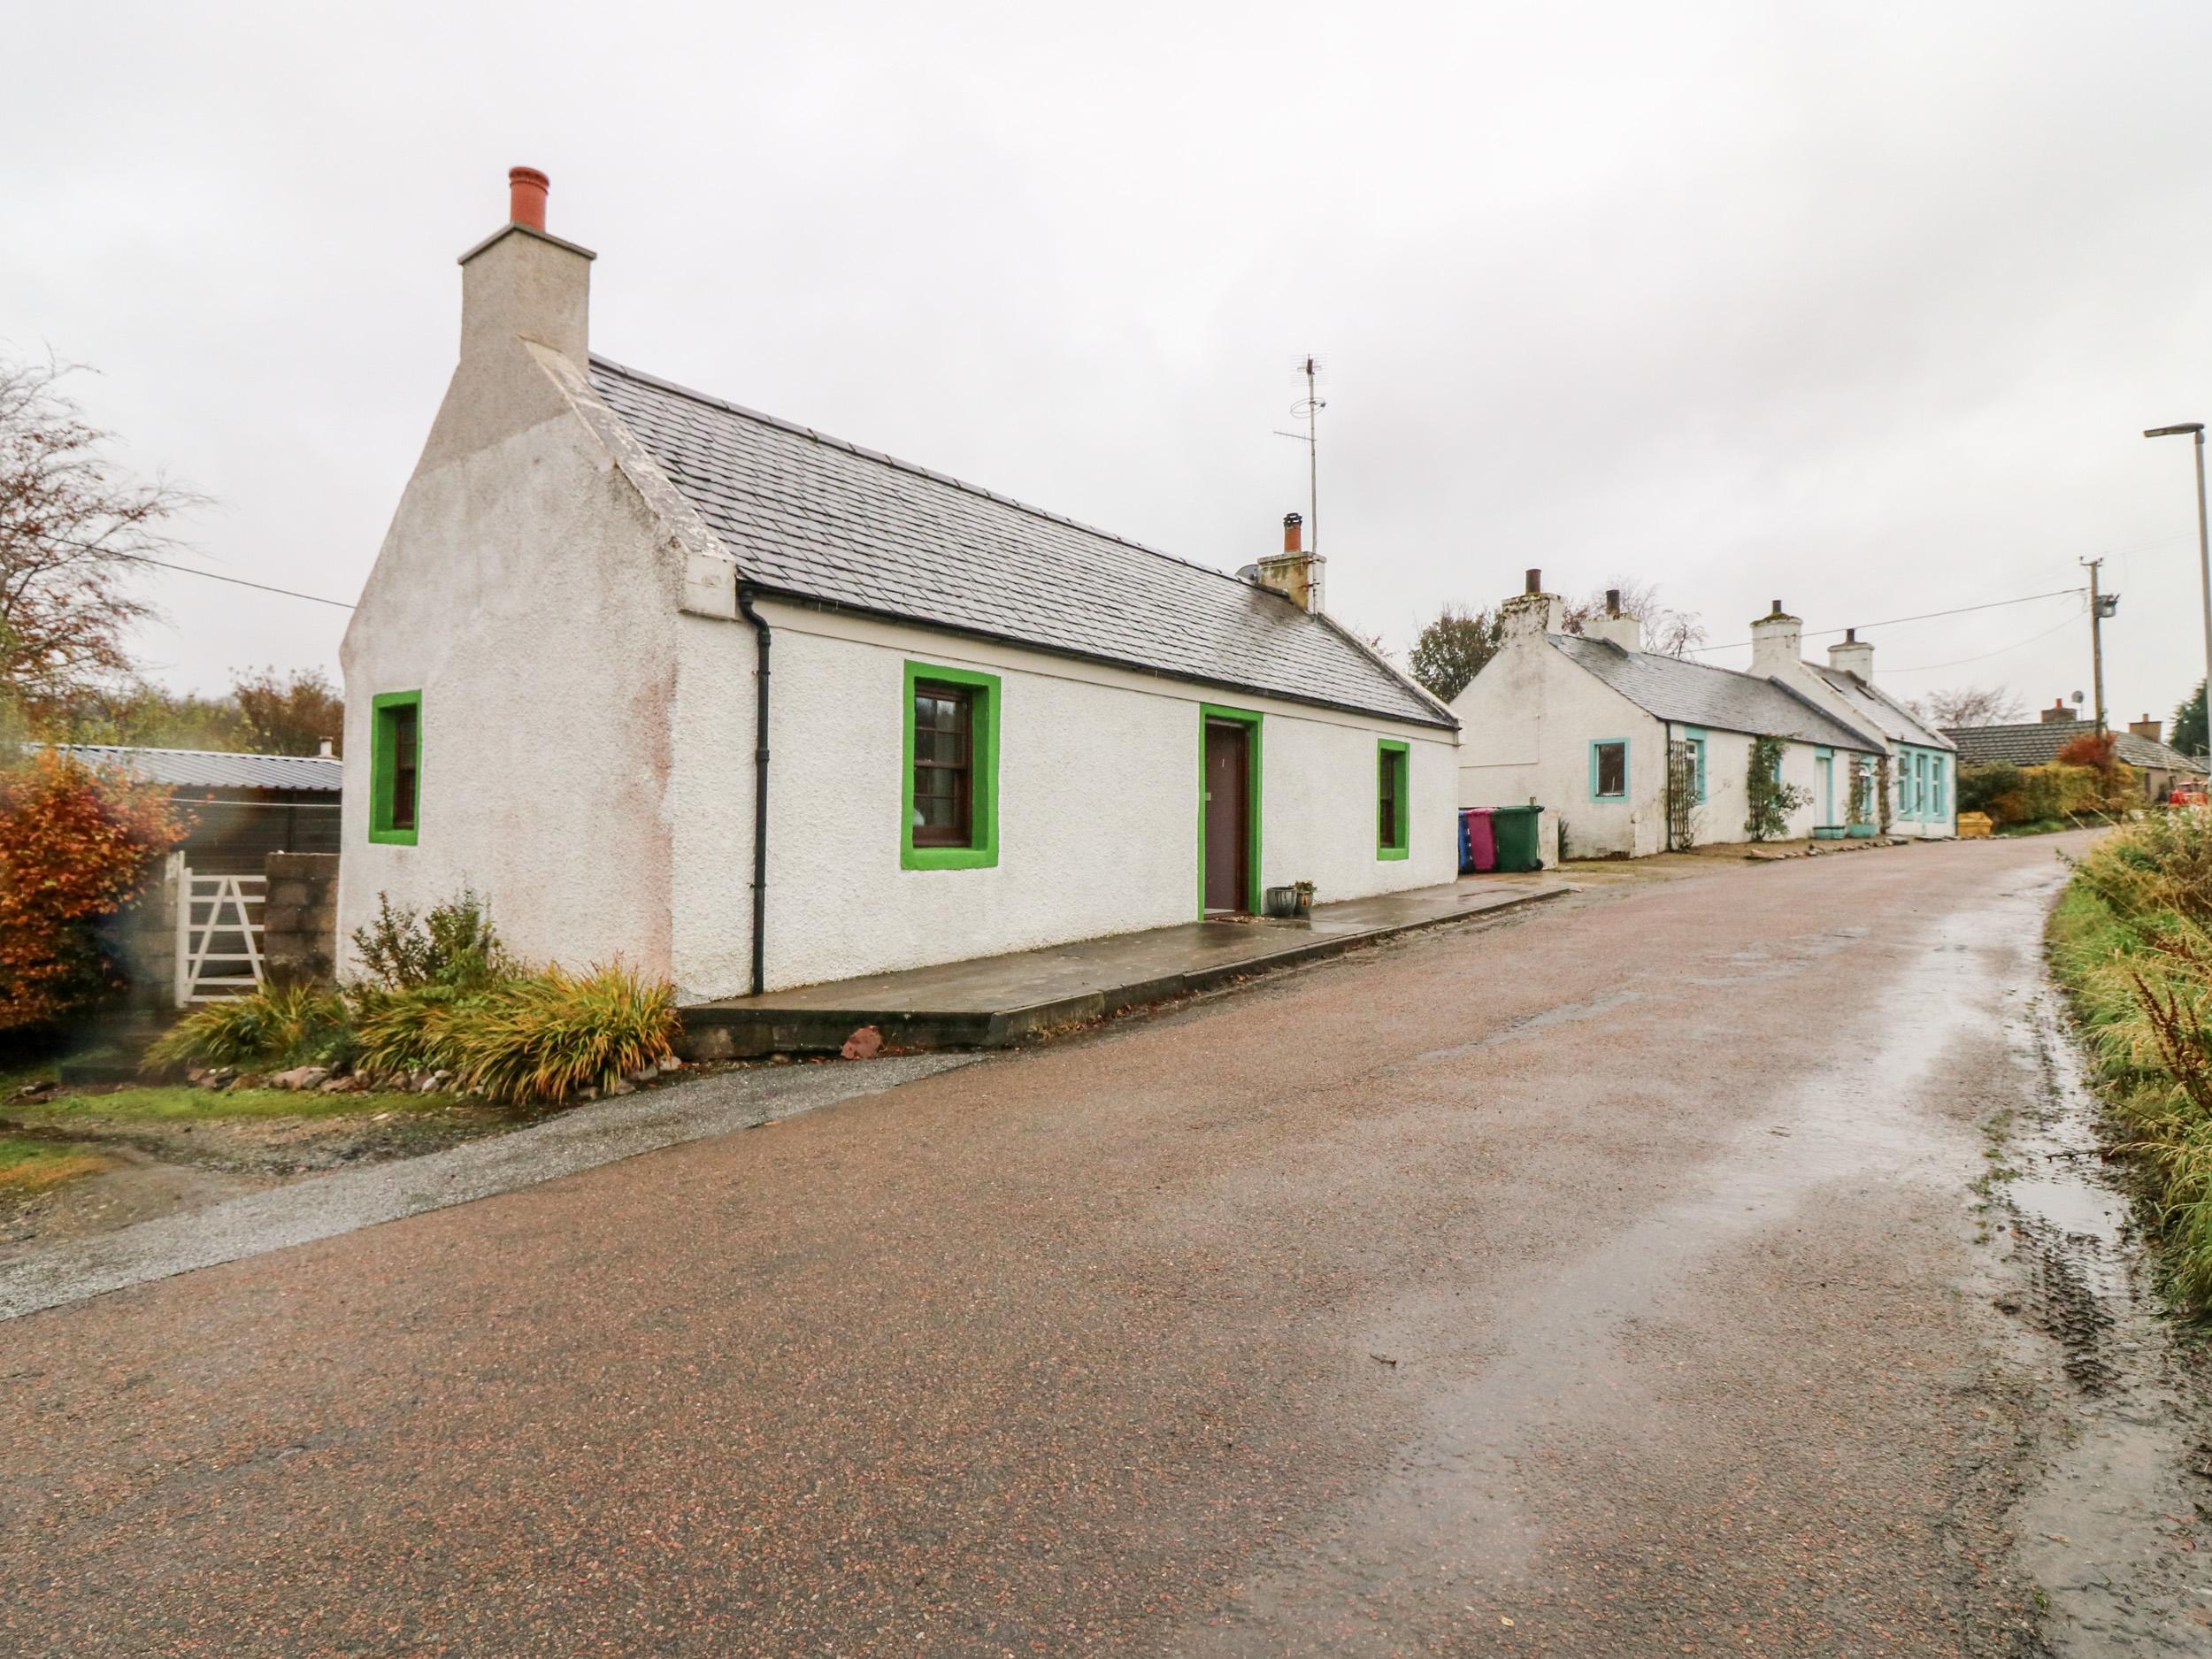 Kitsune Cottage, Moray, Aberdeenshire & The Coastal Trail